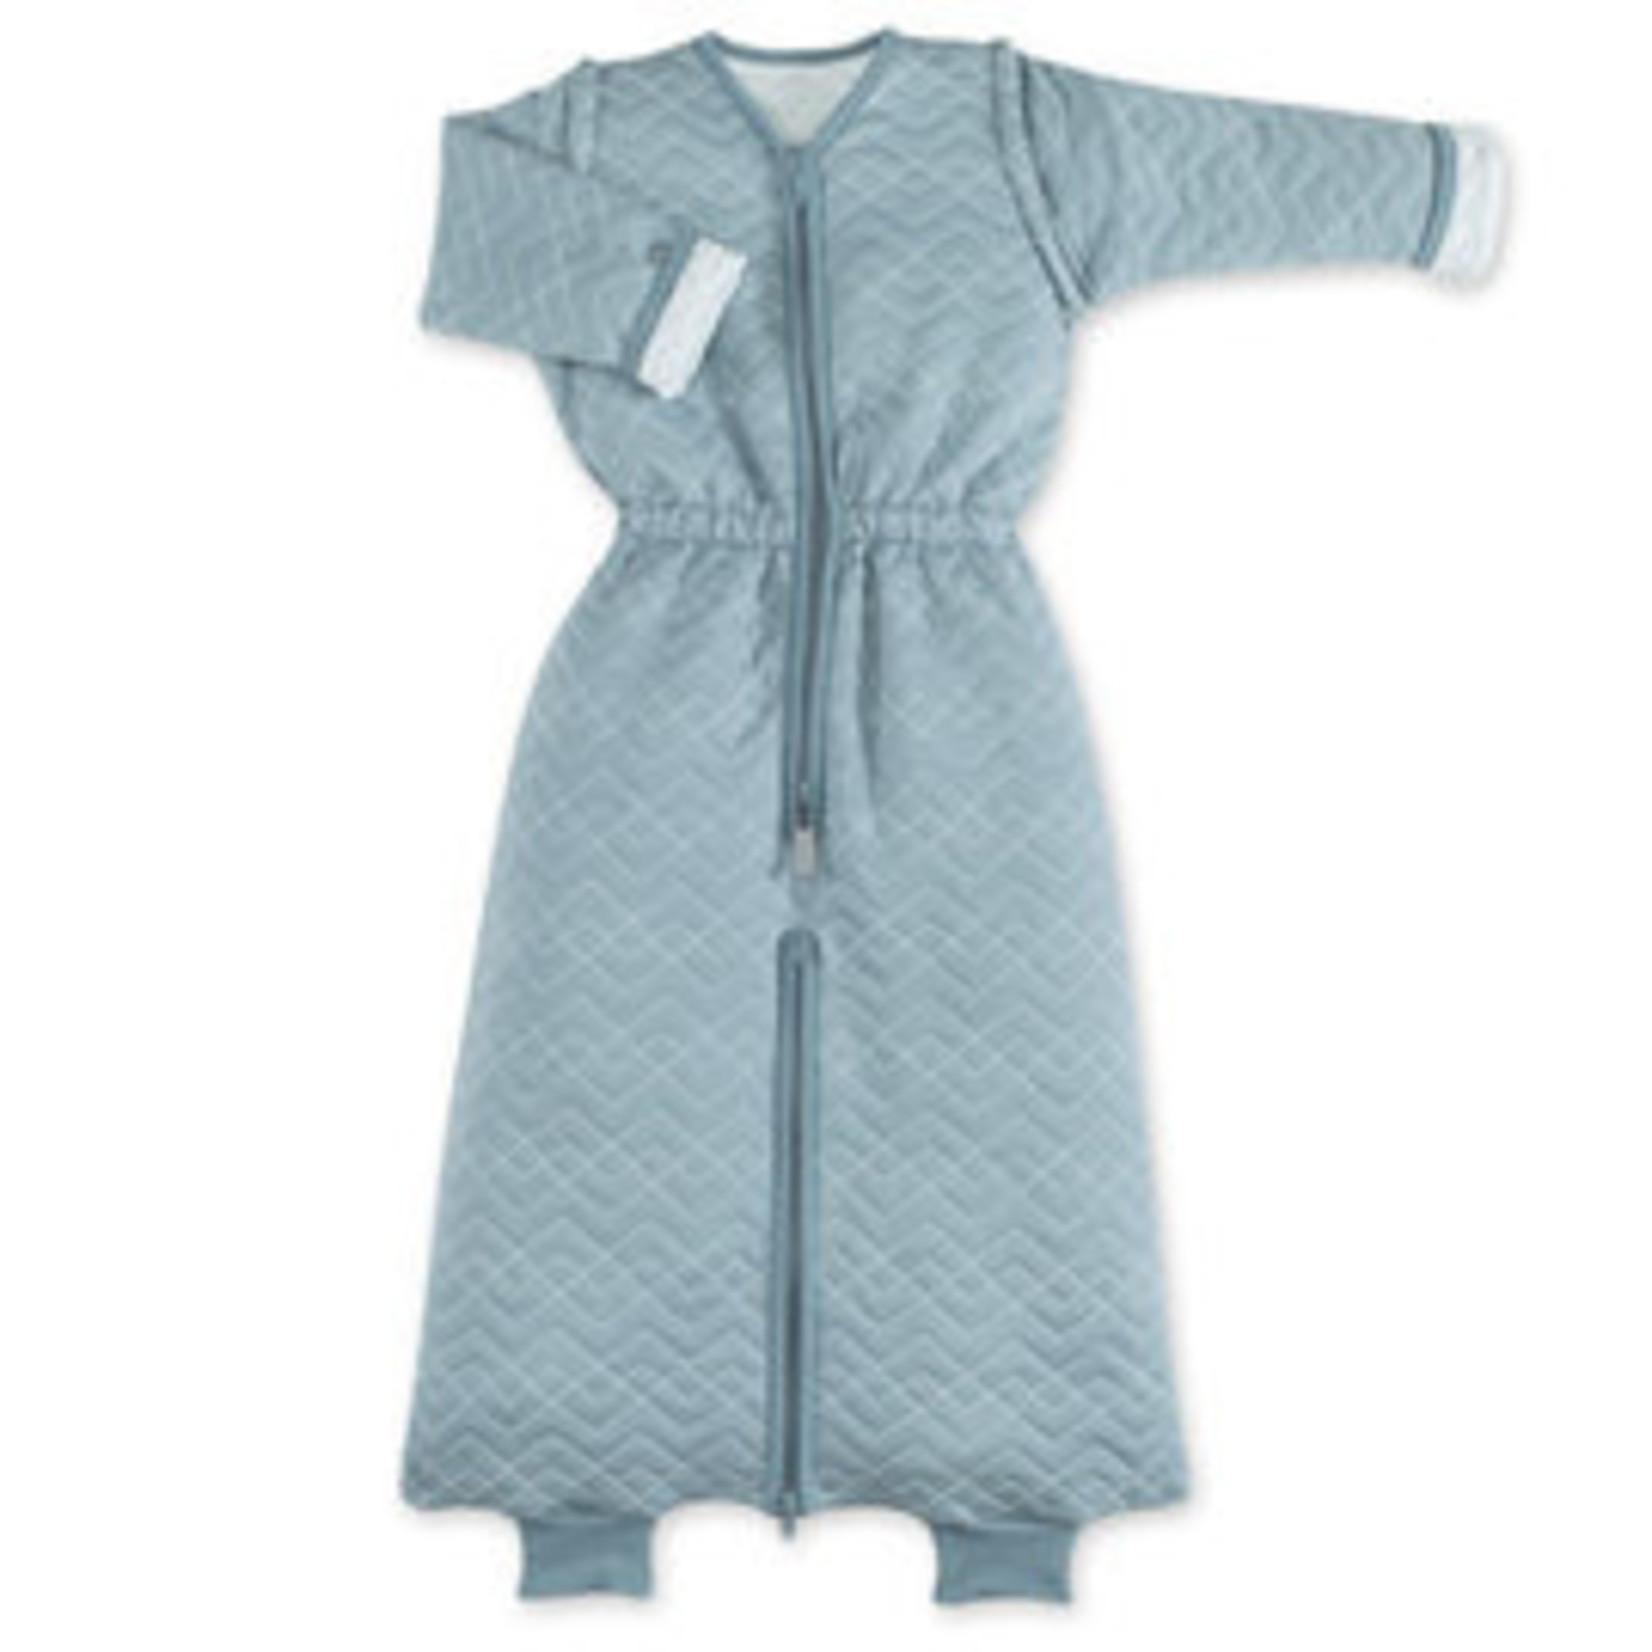 Bemini Bemini Slaapzak Magic bag Mineraal blauw 18-36 maand Pady Jersey TOG 1.5. 193OSAKA65OU